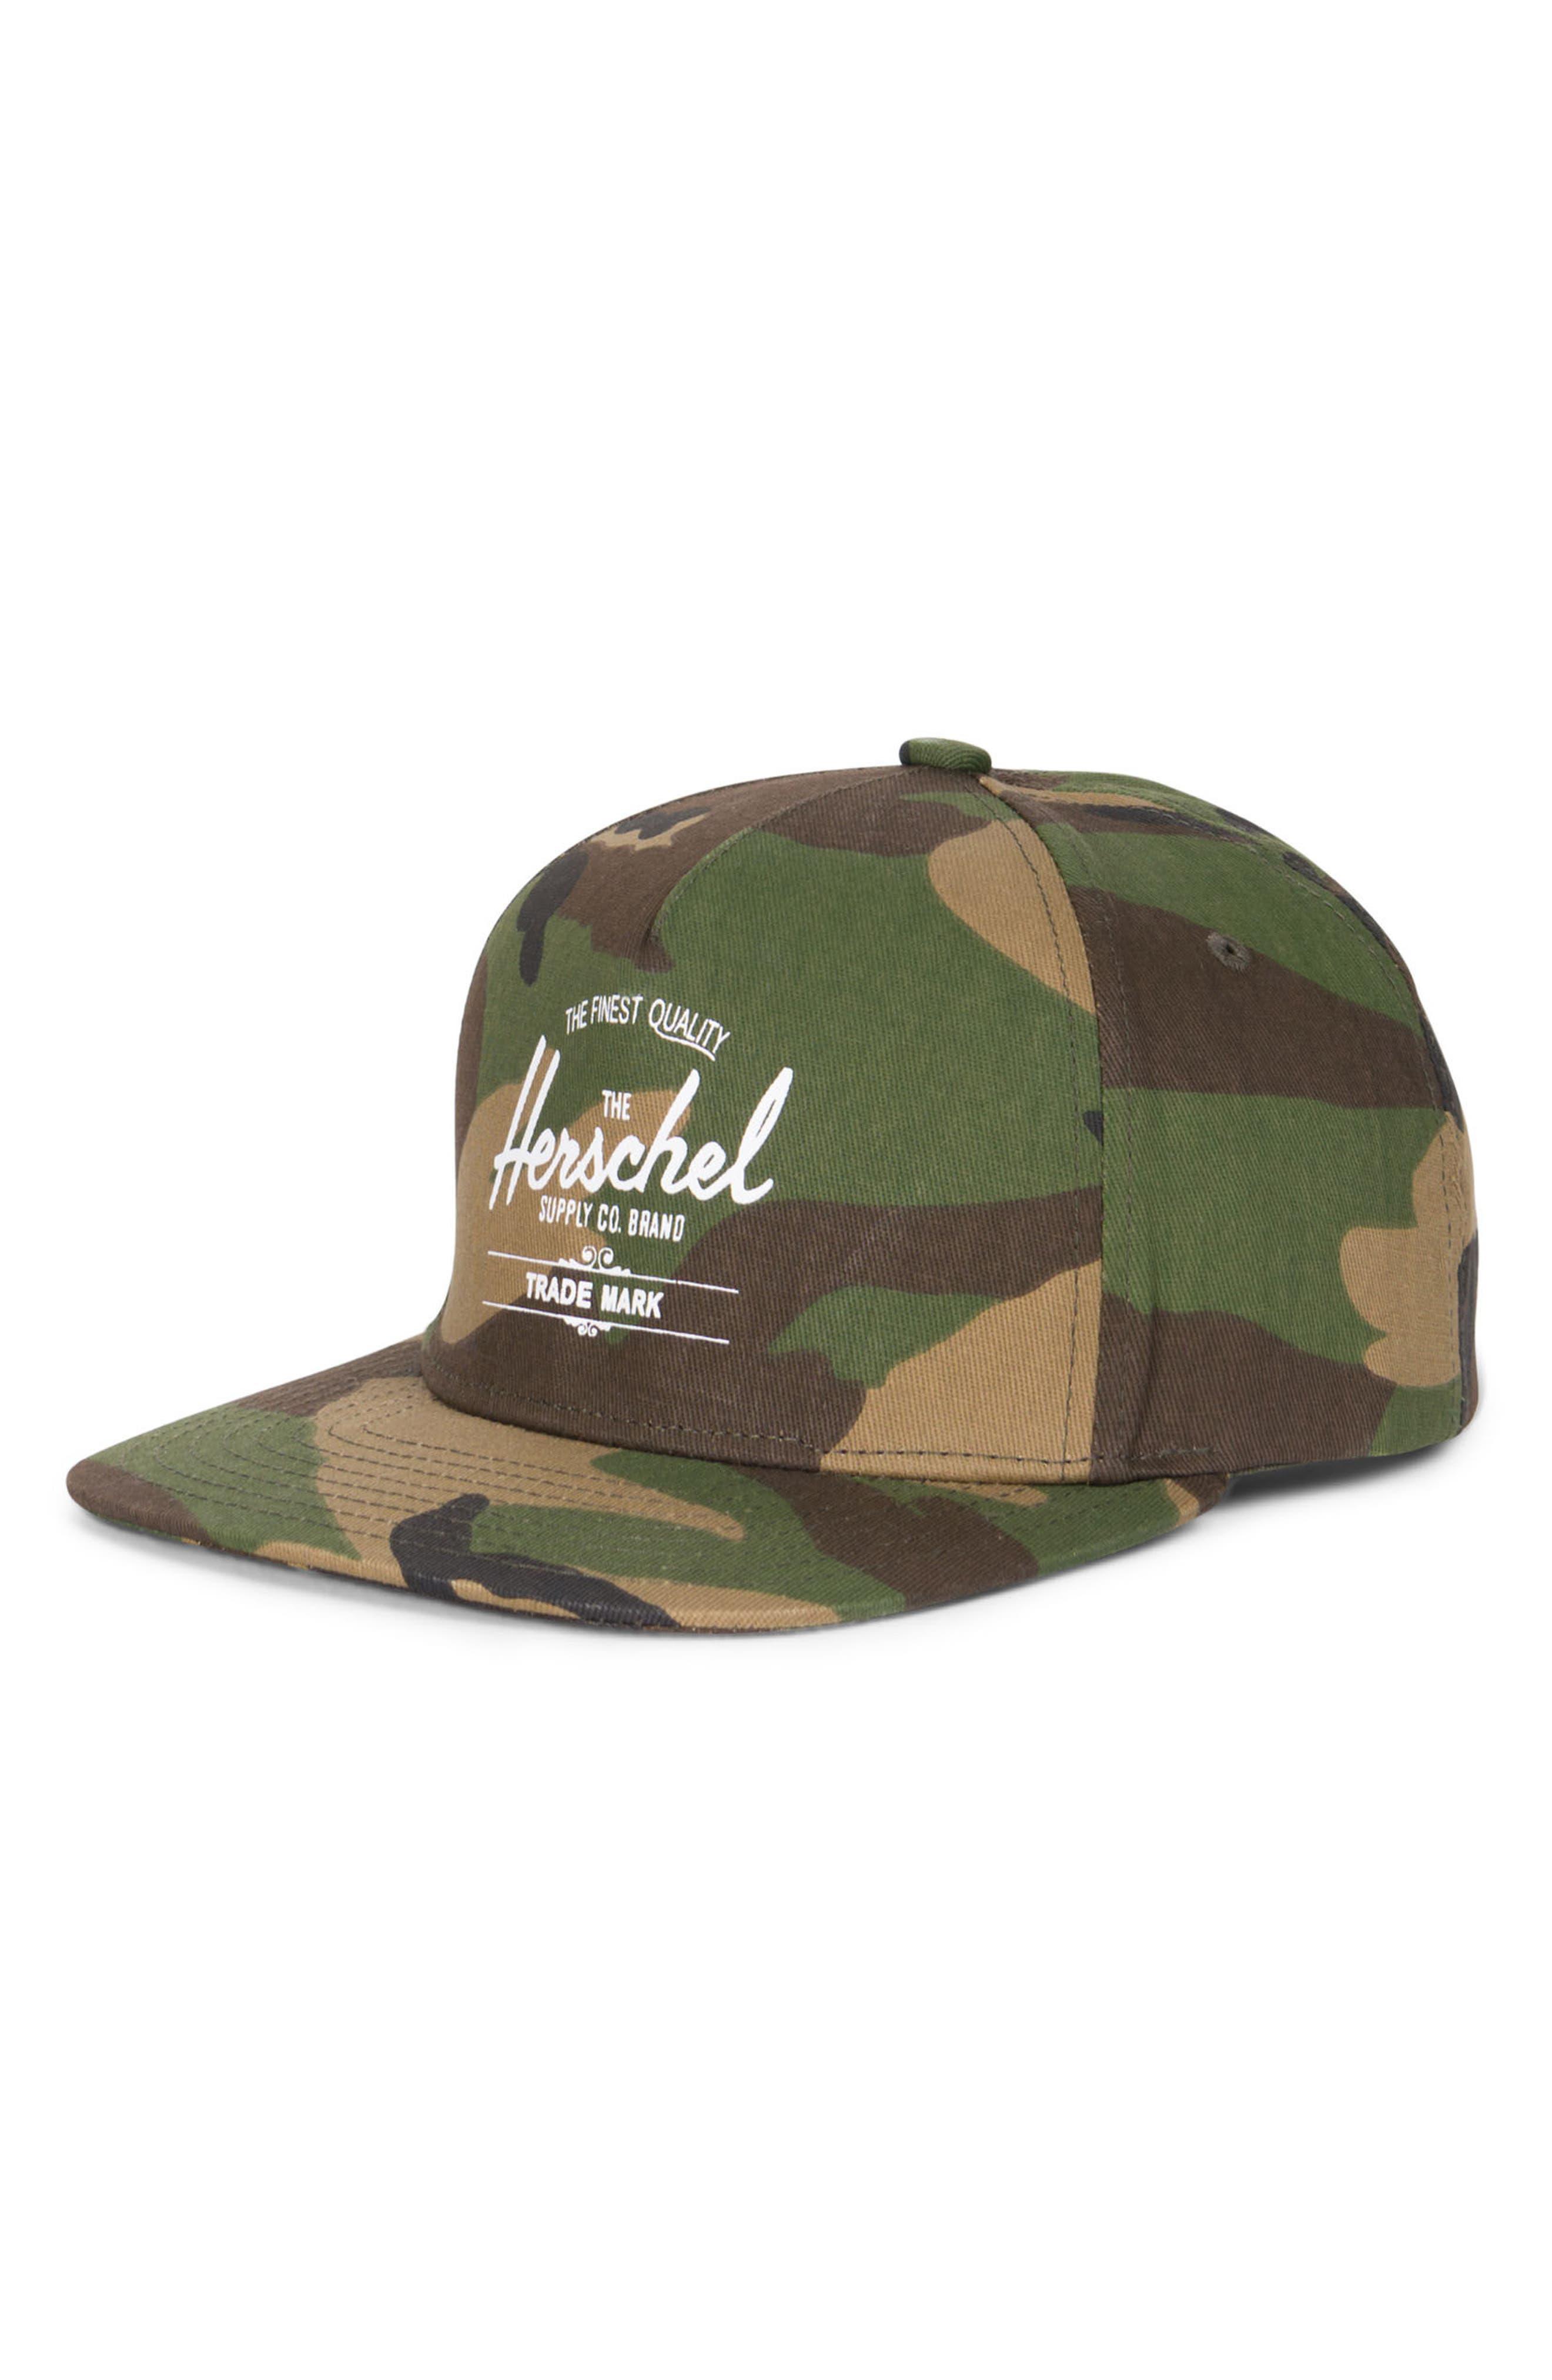 Main Image - Herschel Supply Co. Whaler Snapback Baseball Cap